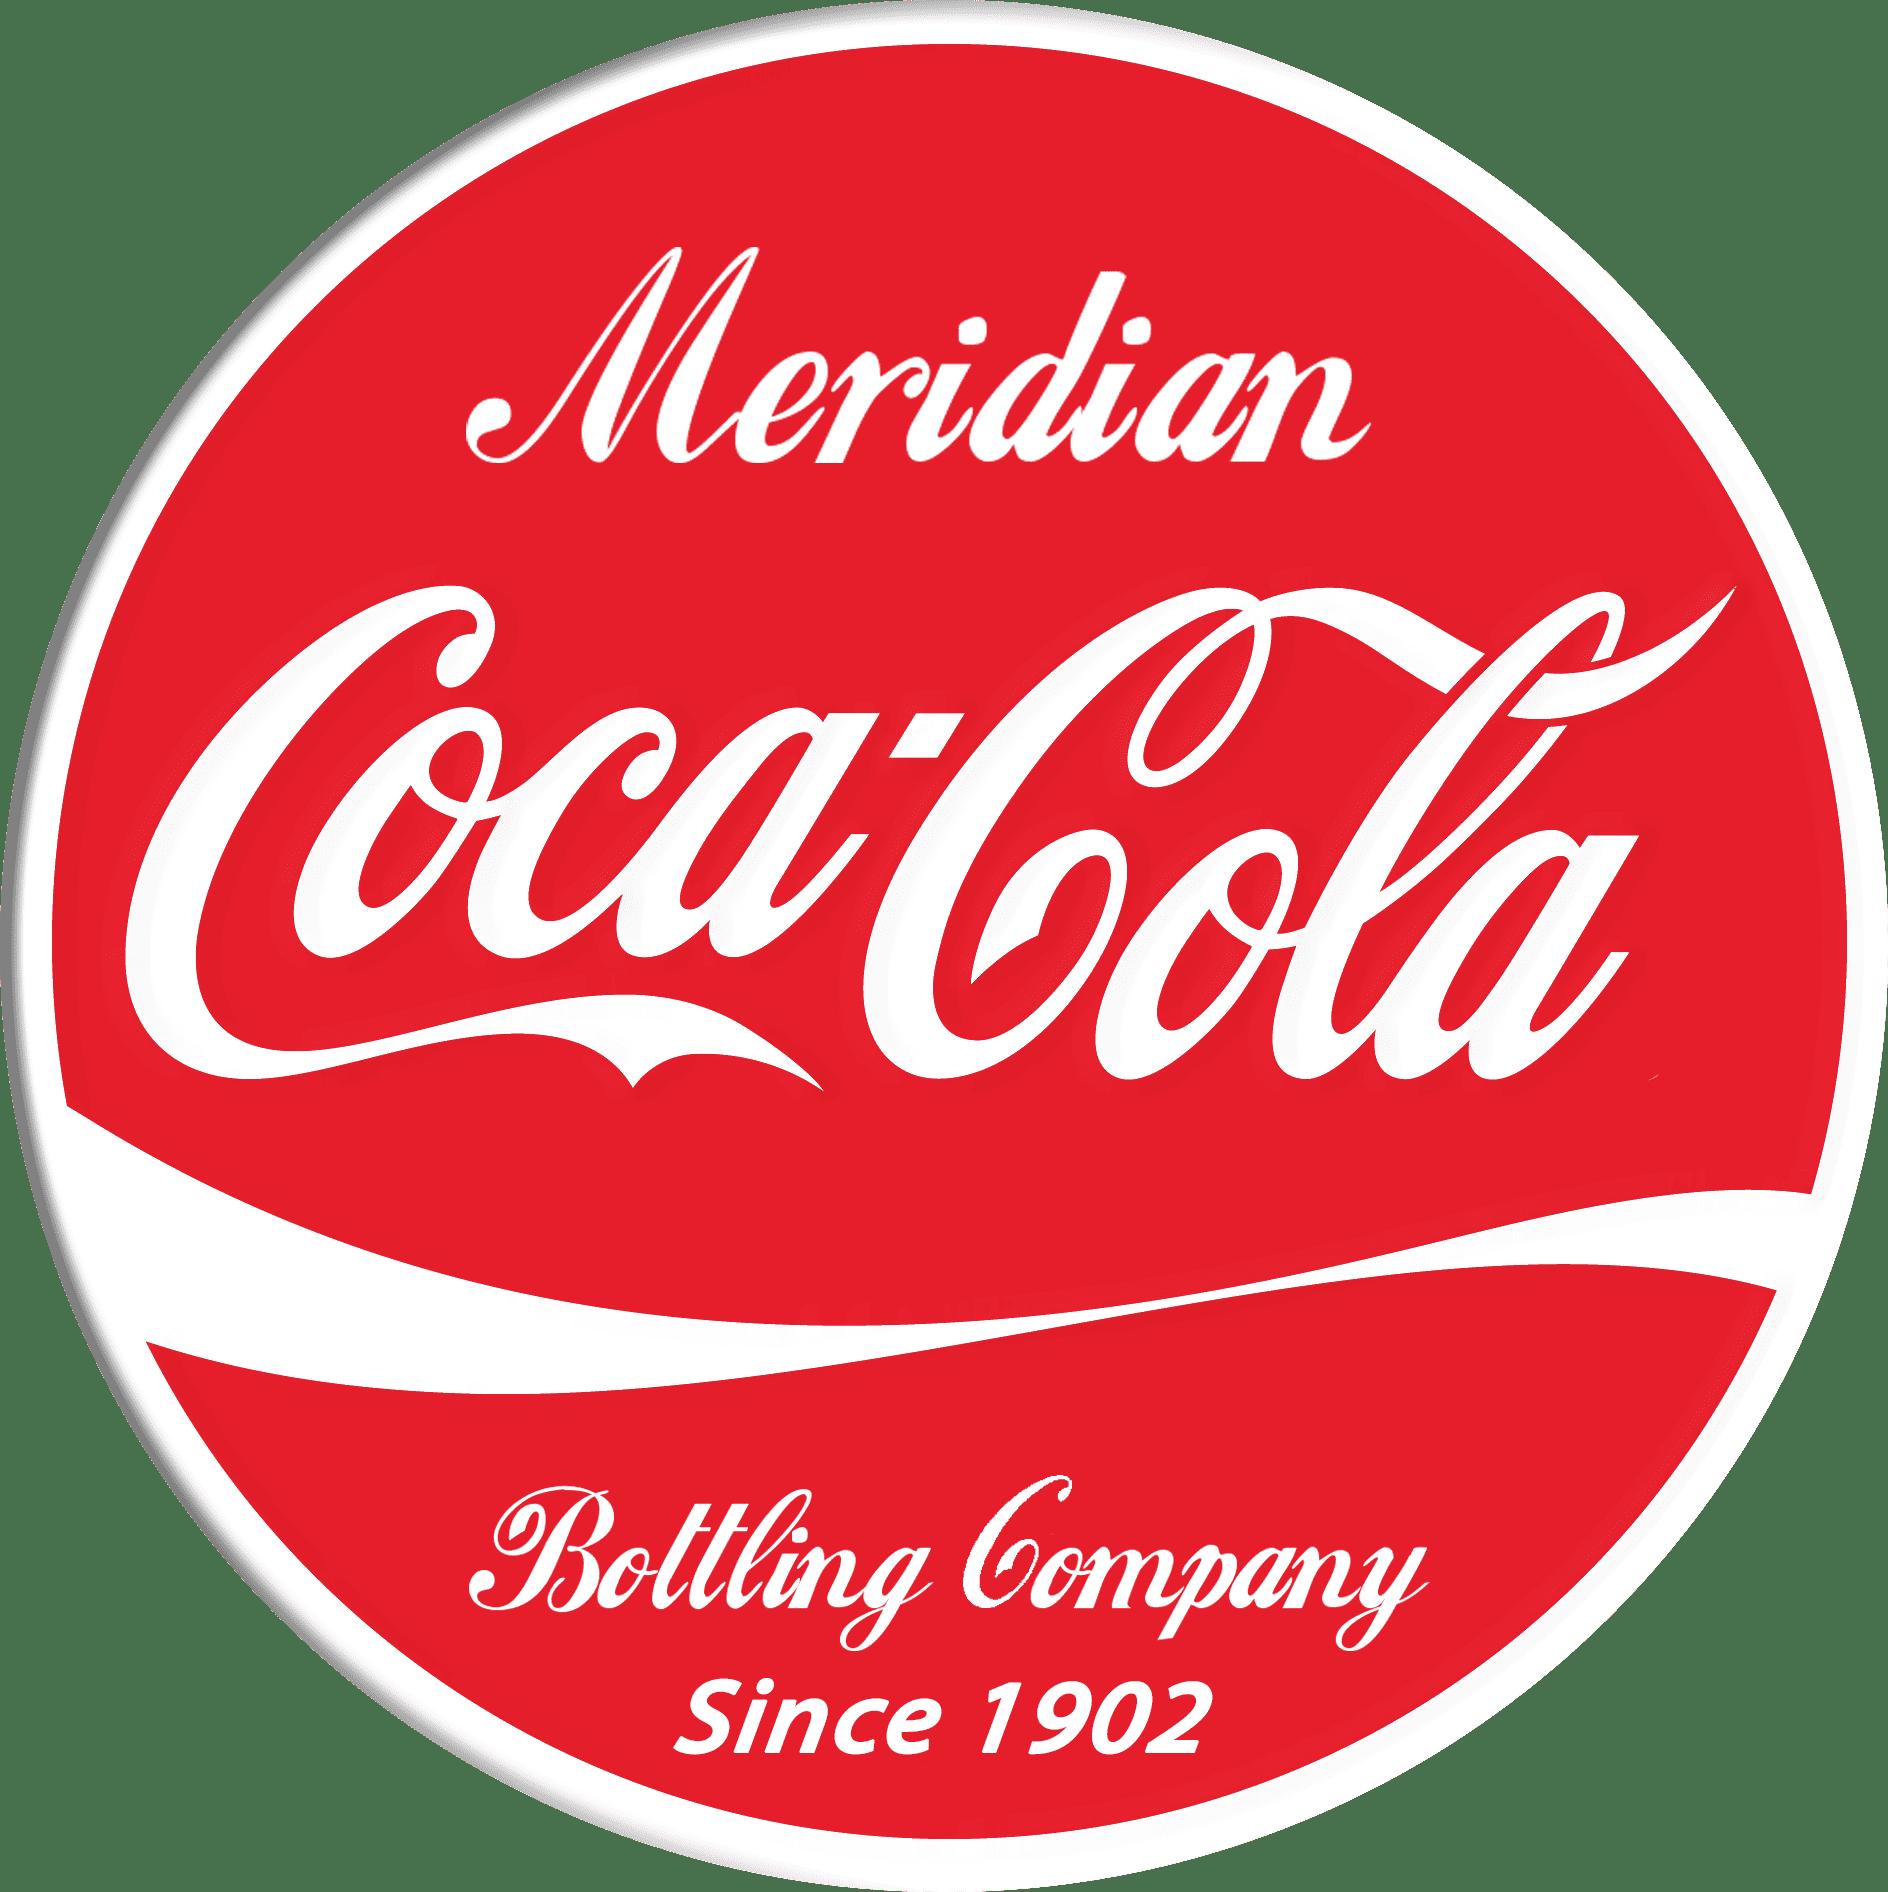 Meridian Coca-Cola